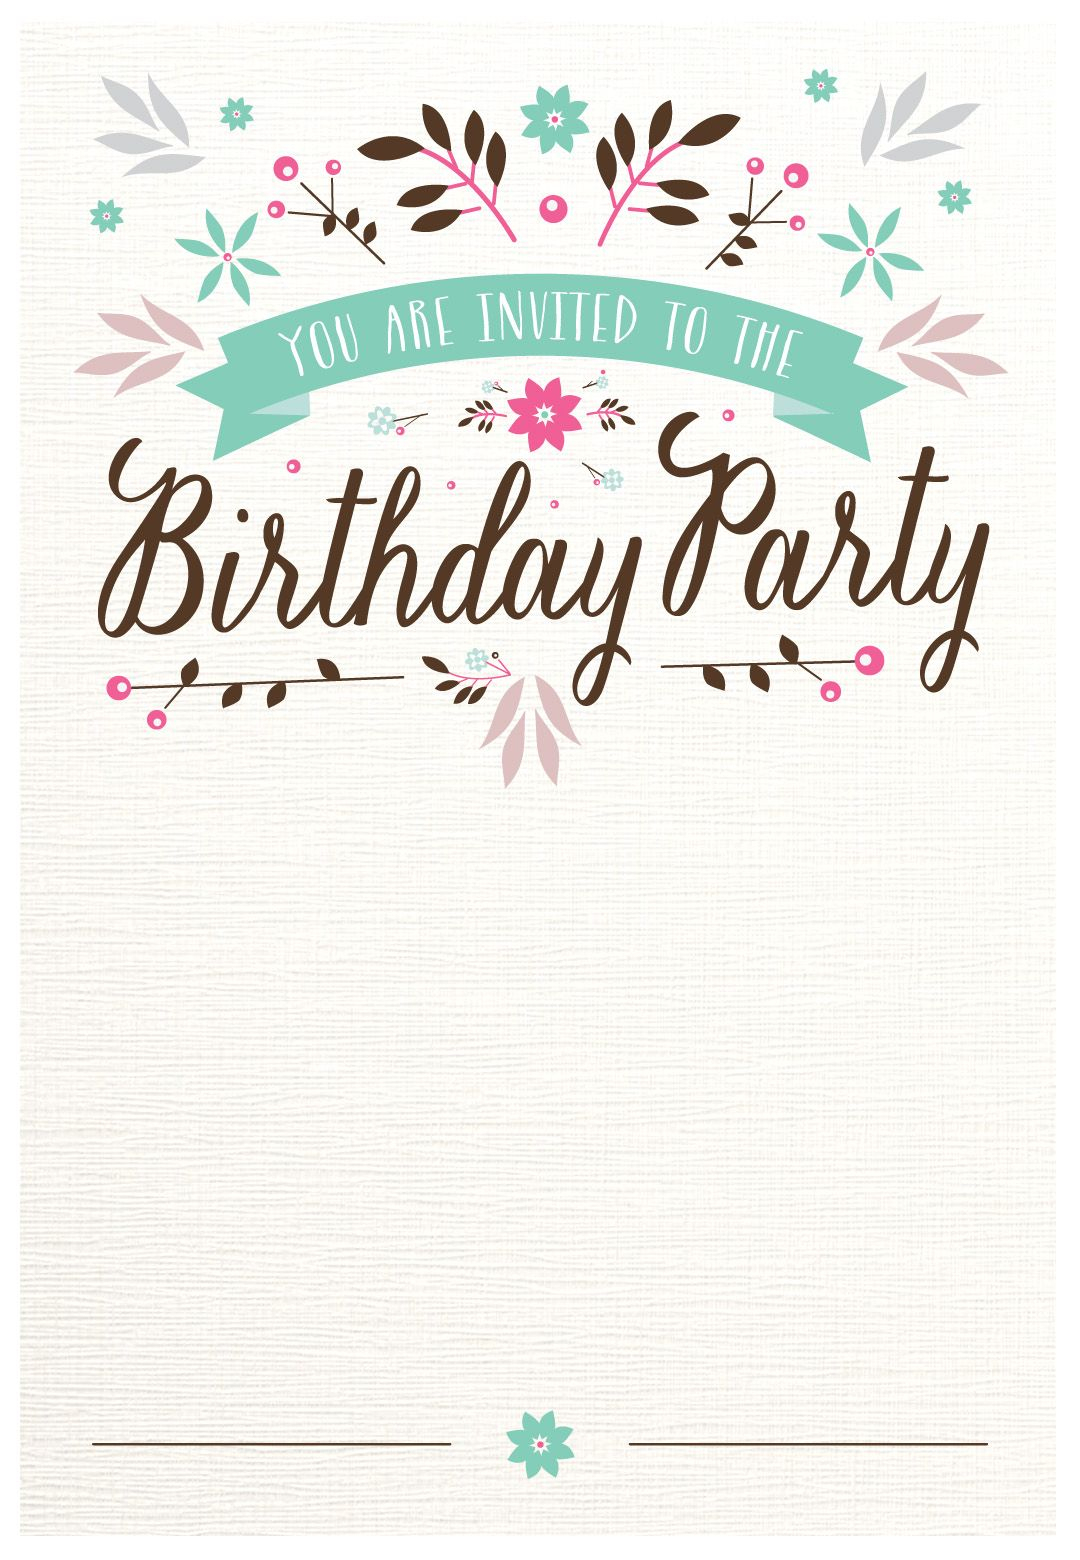 Flat Floral - Free Printable Birthday Invitation Template - Free Printable Invitations